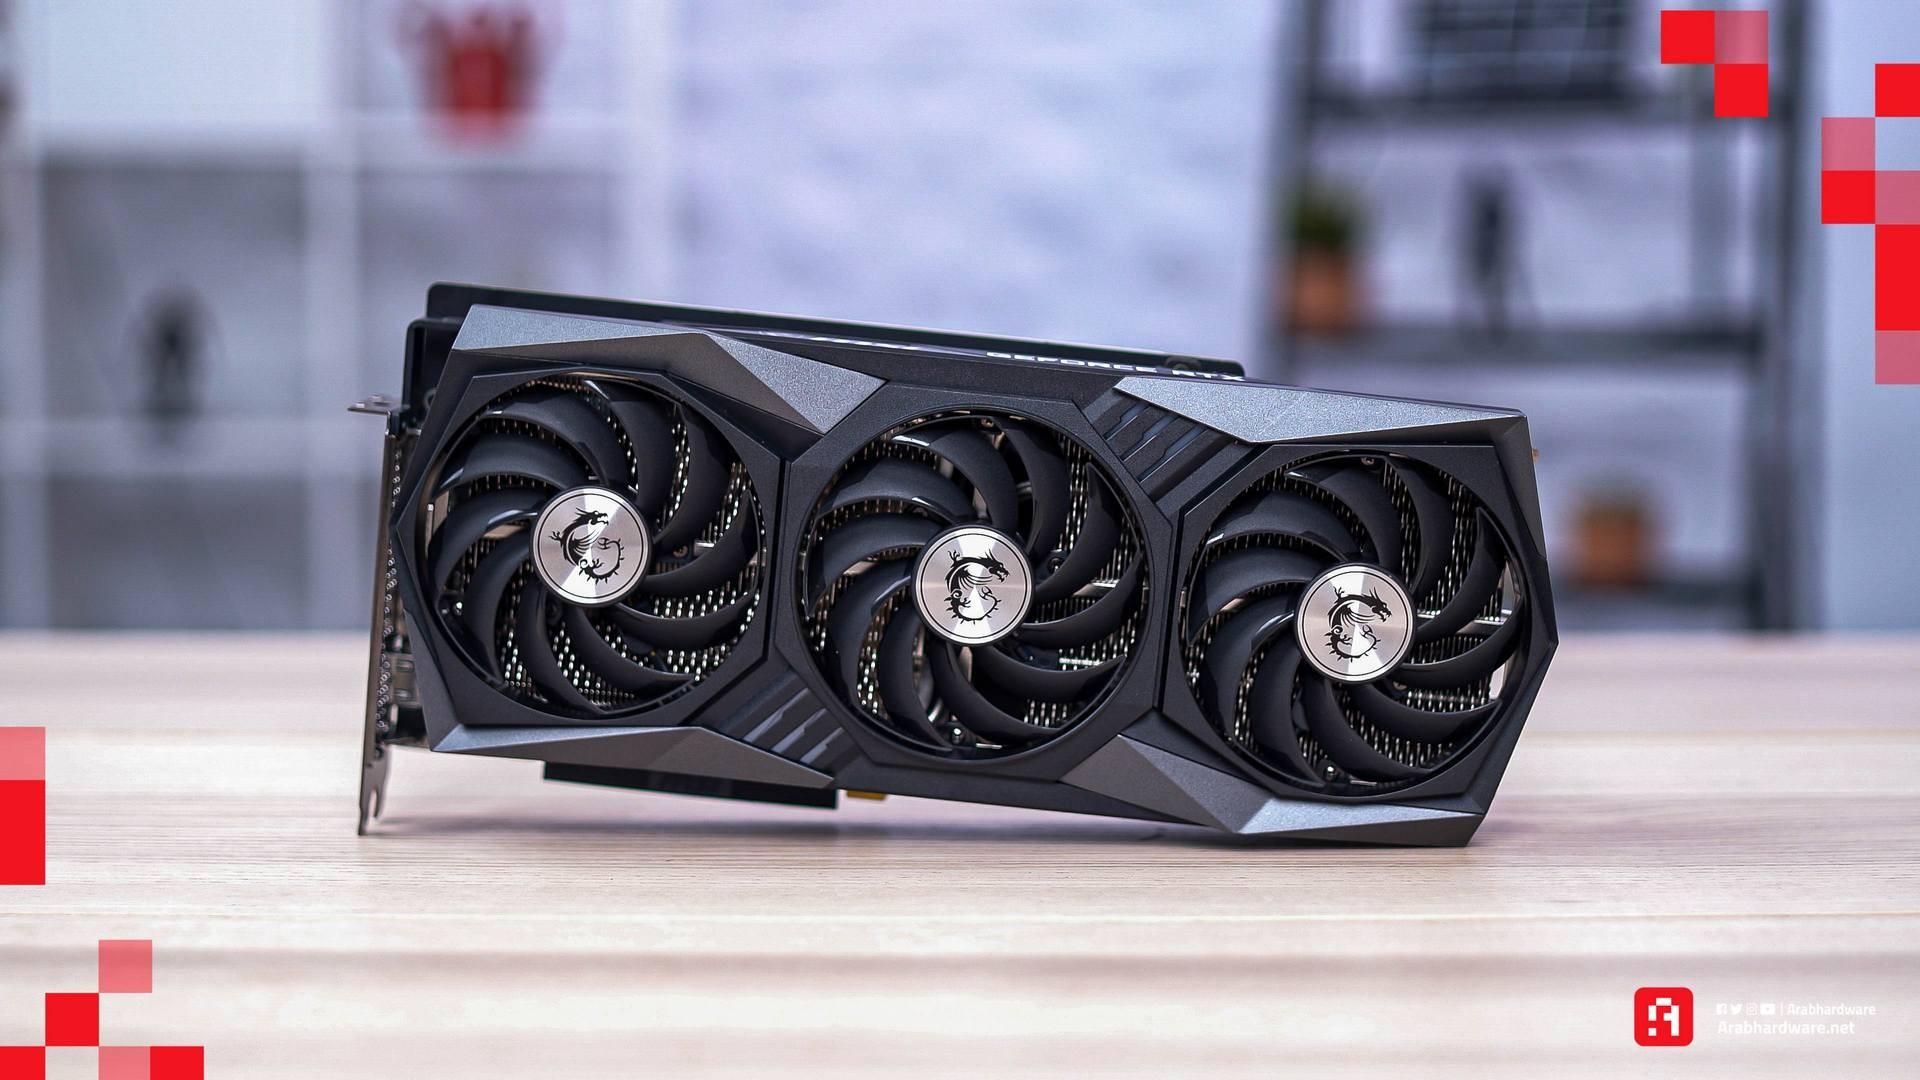 MSI GeForce RTX 3080